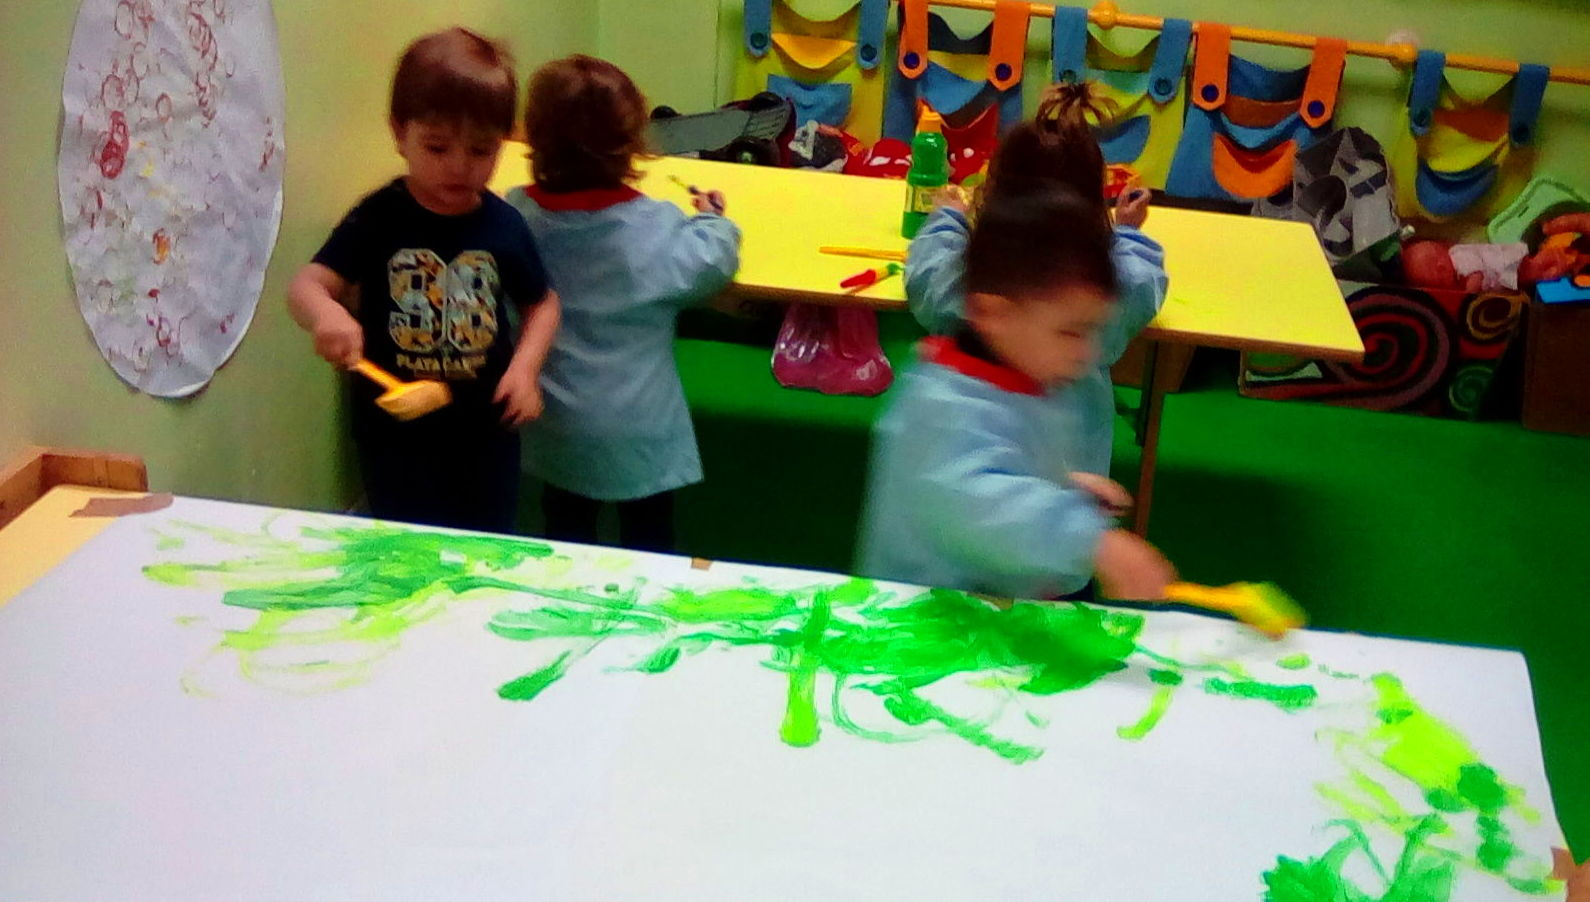 Foto 34 de Escuela infantil en Algete | E.I. Cuatro Pecas de Colores